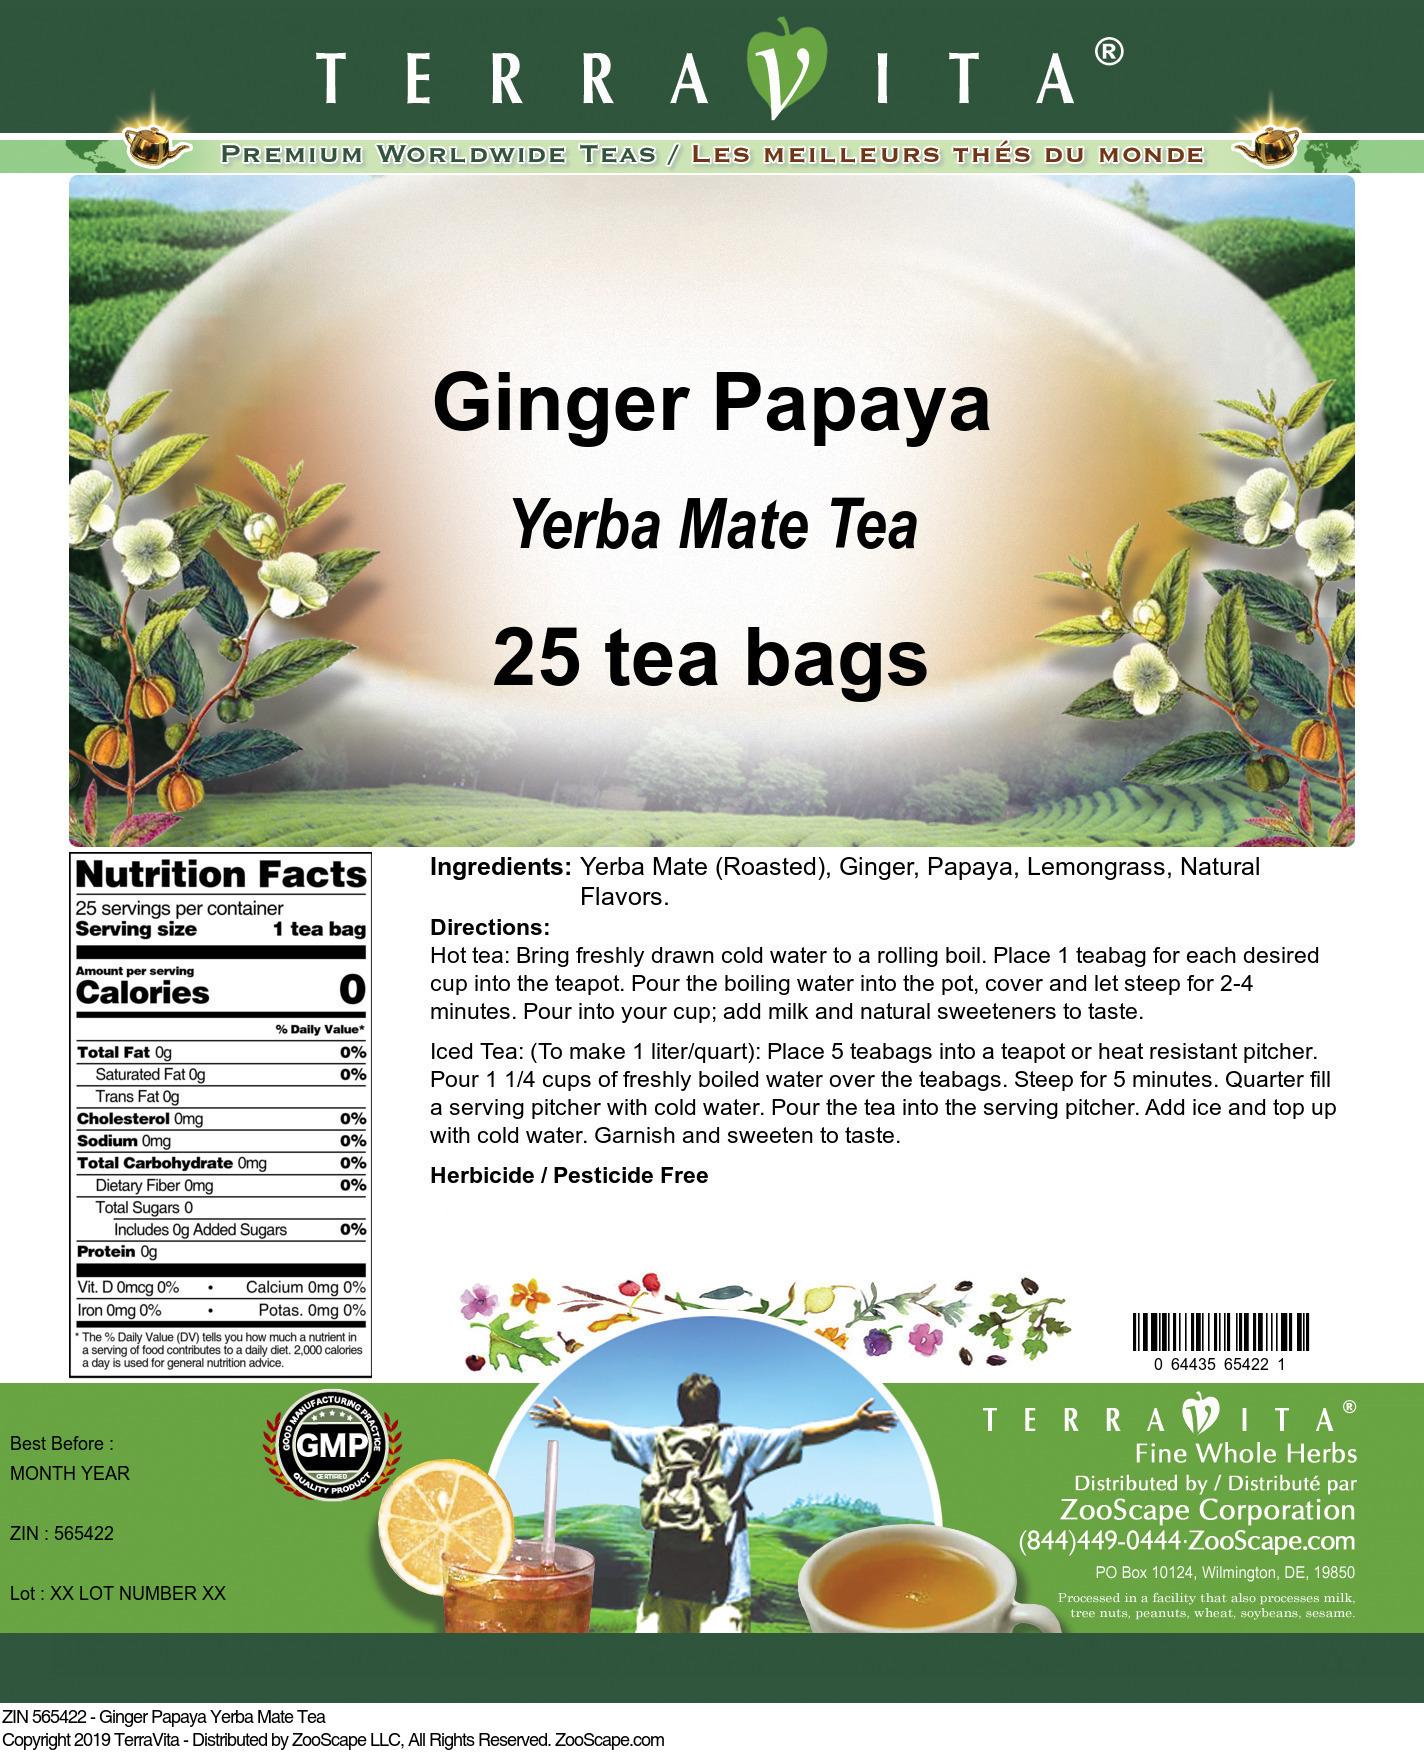 Ginger Papaya Yerba Mate